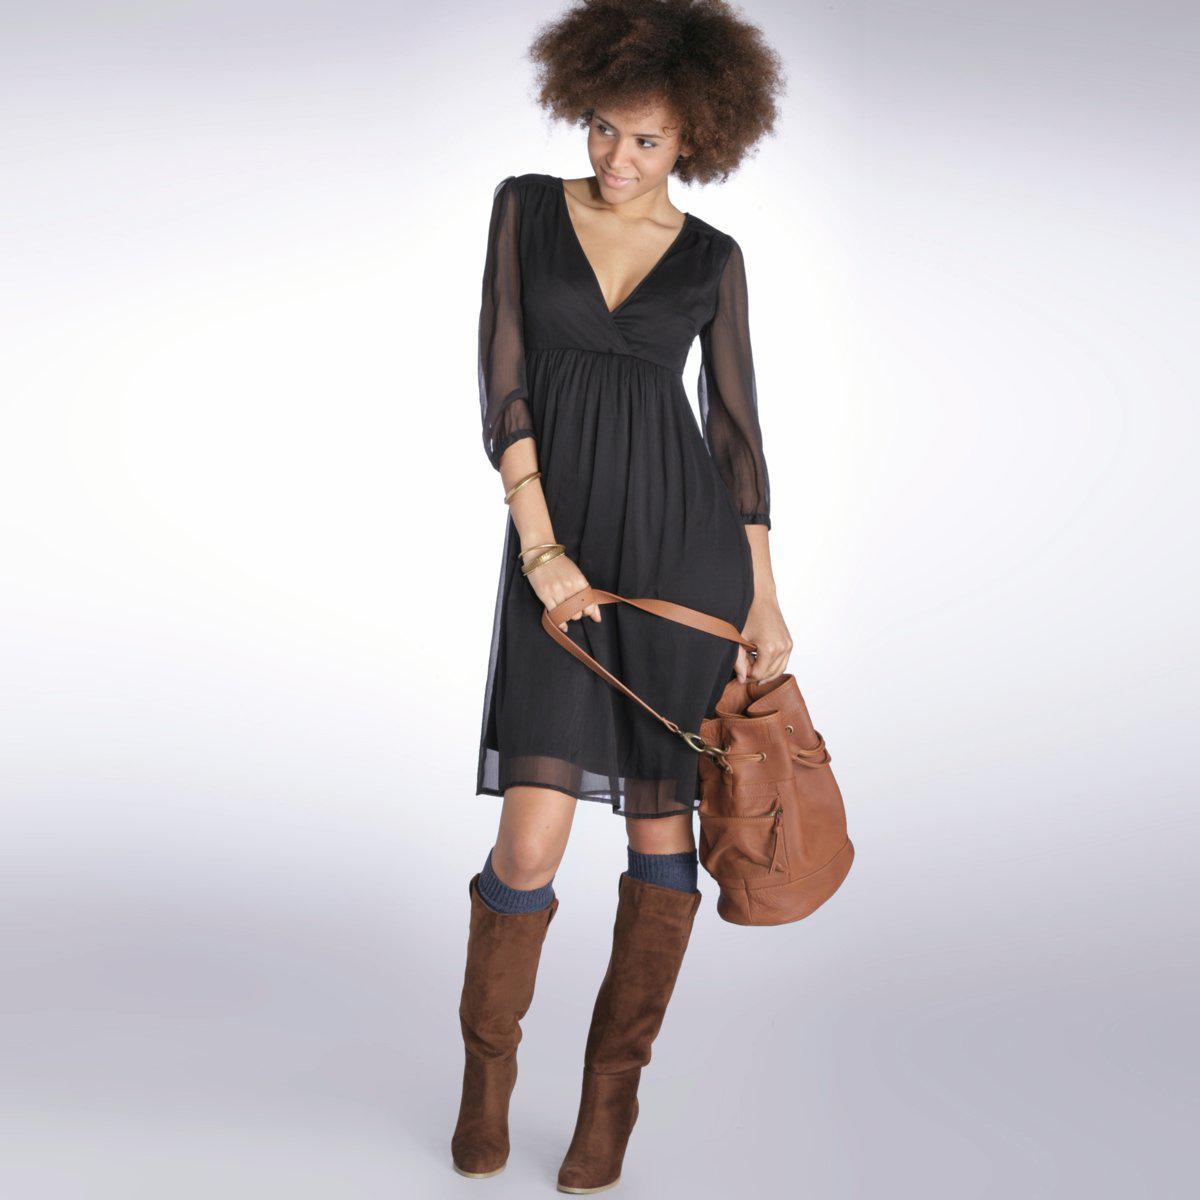 db000f17780b Φορεματα LaRedoute Φθινόπωρο Χειμώνας 2011 Κωδ. 324205182